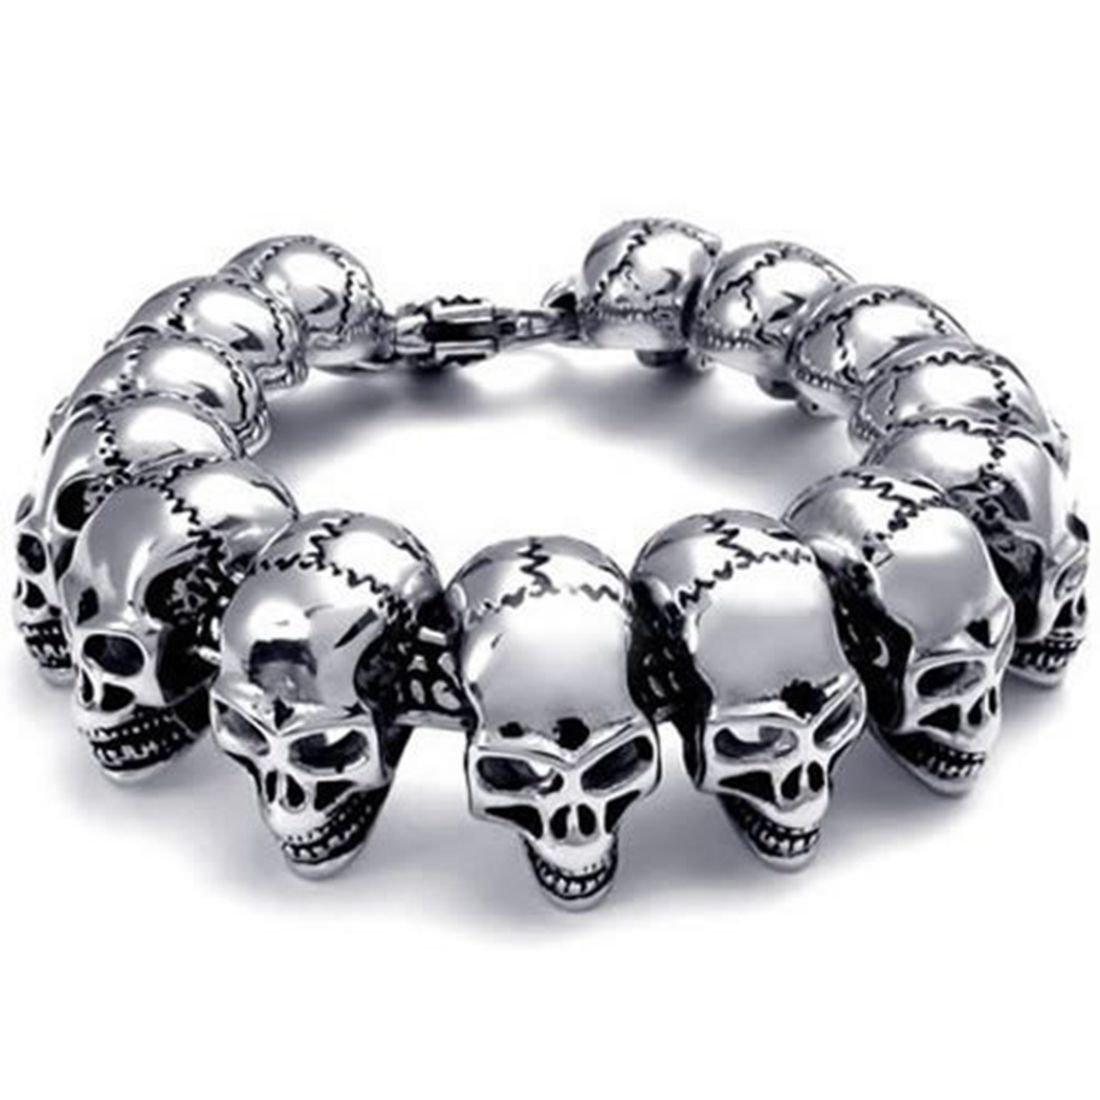 Elove Jewelry Large Gothic Skull Biker Stainless Steel Men's Bracelet Lovejewelry ELV201503000